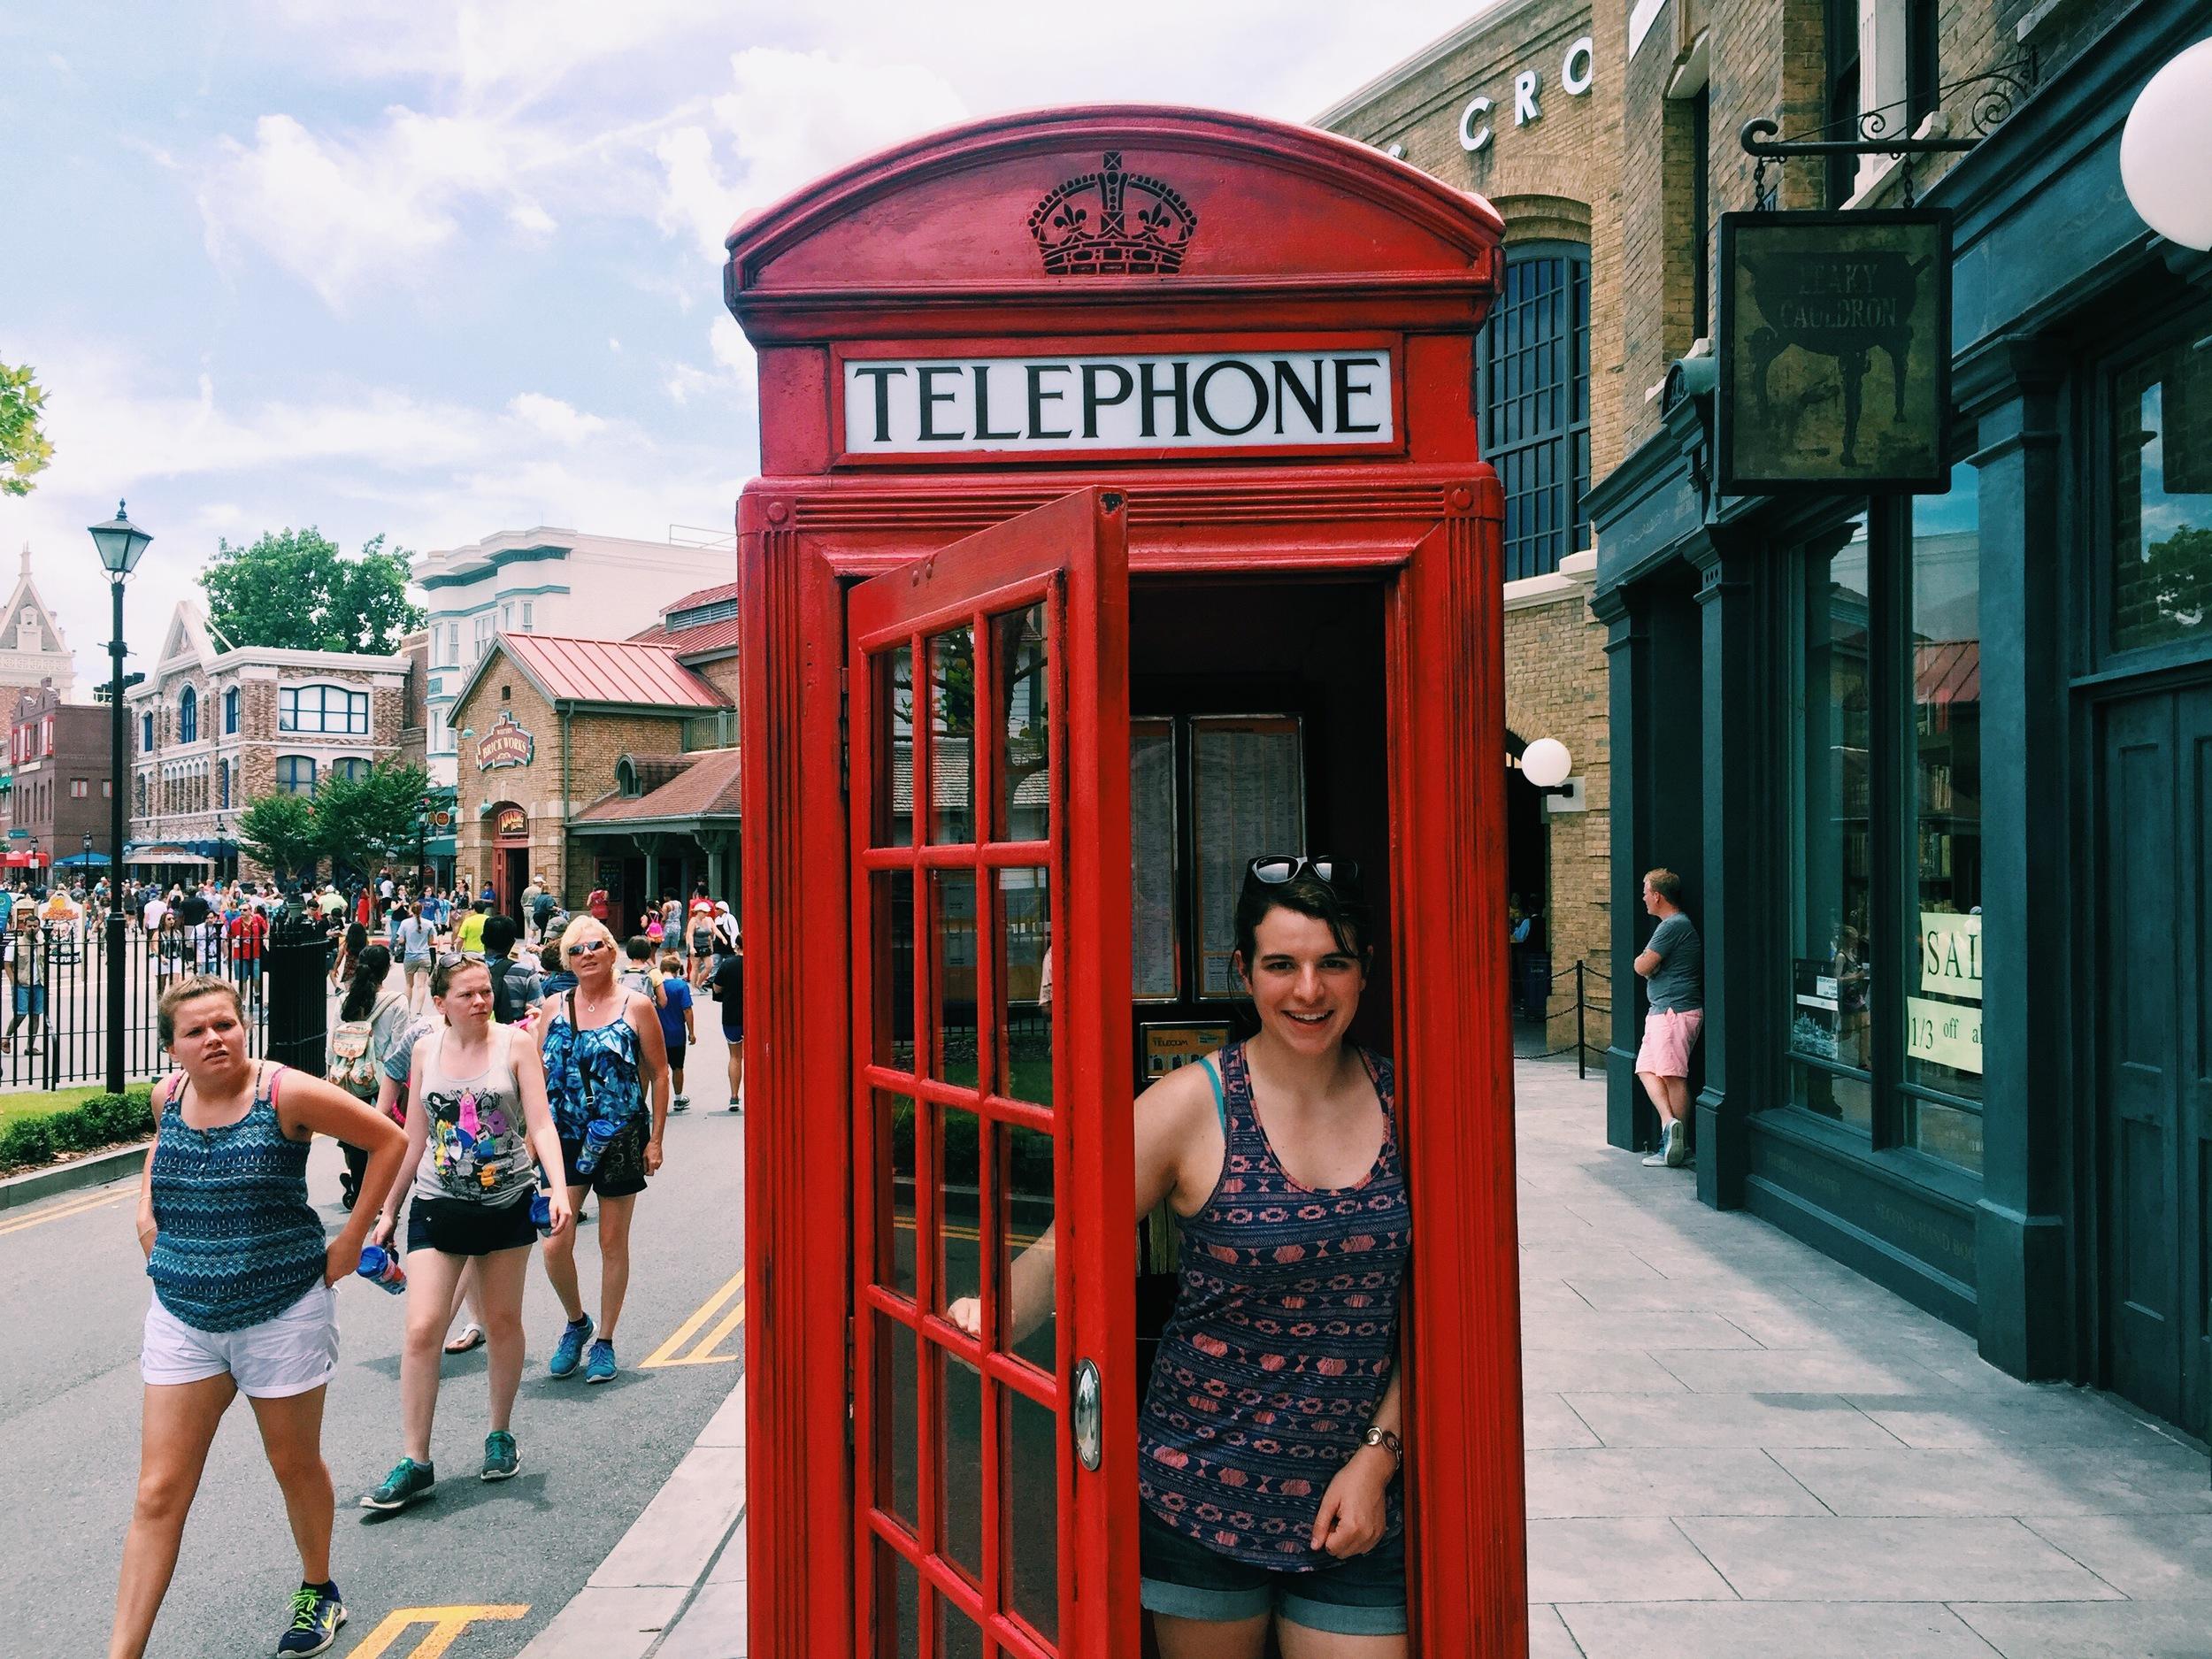 universal-studios-orlando-diagon-alley-telephone